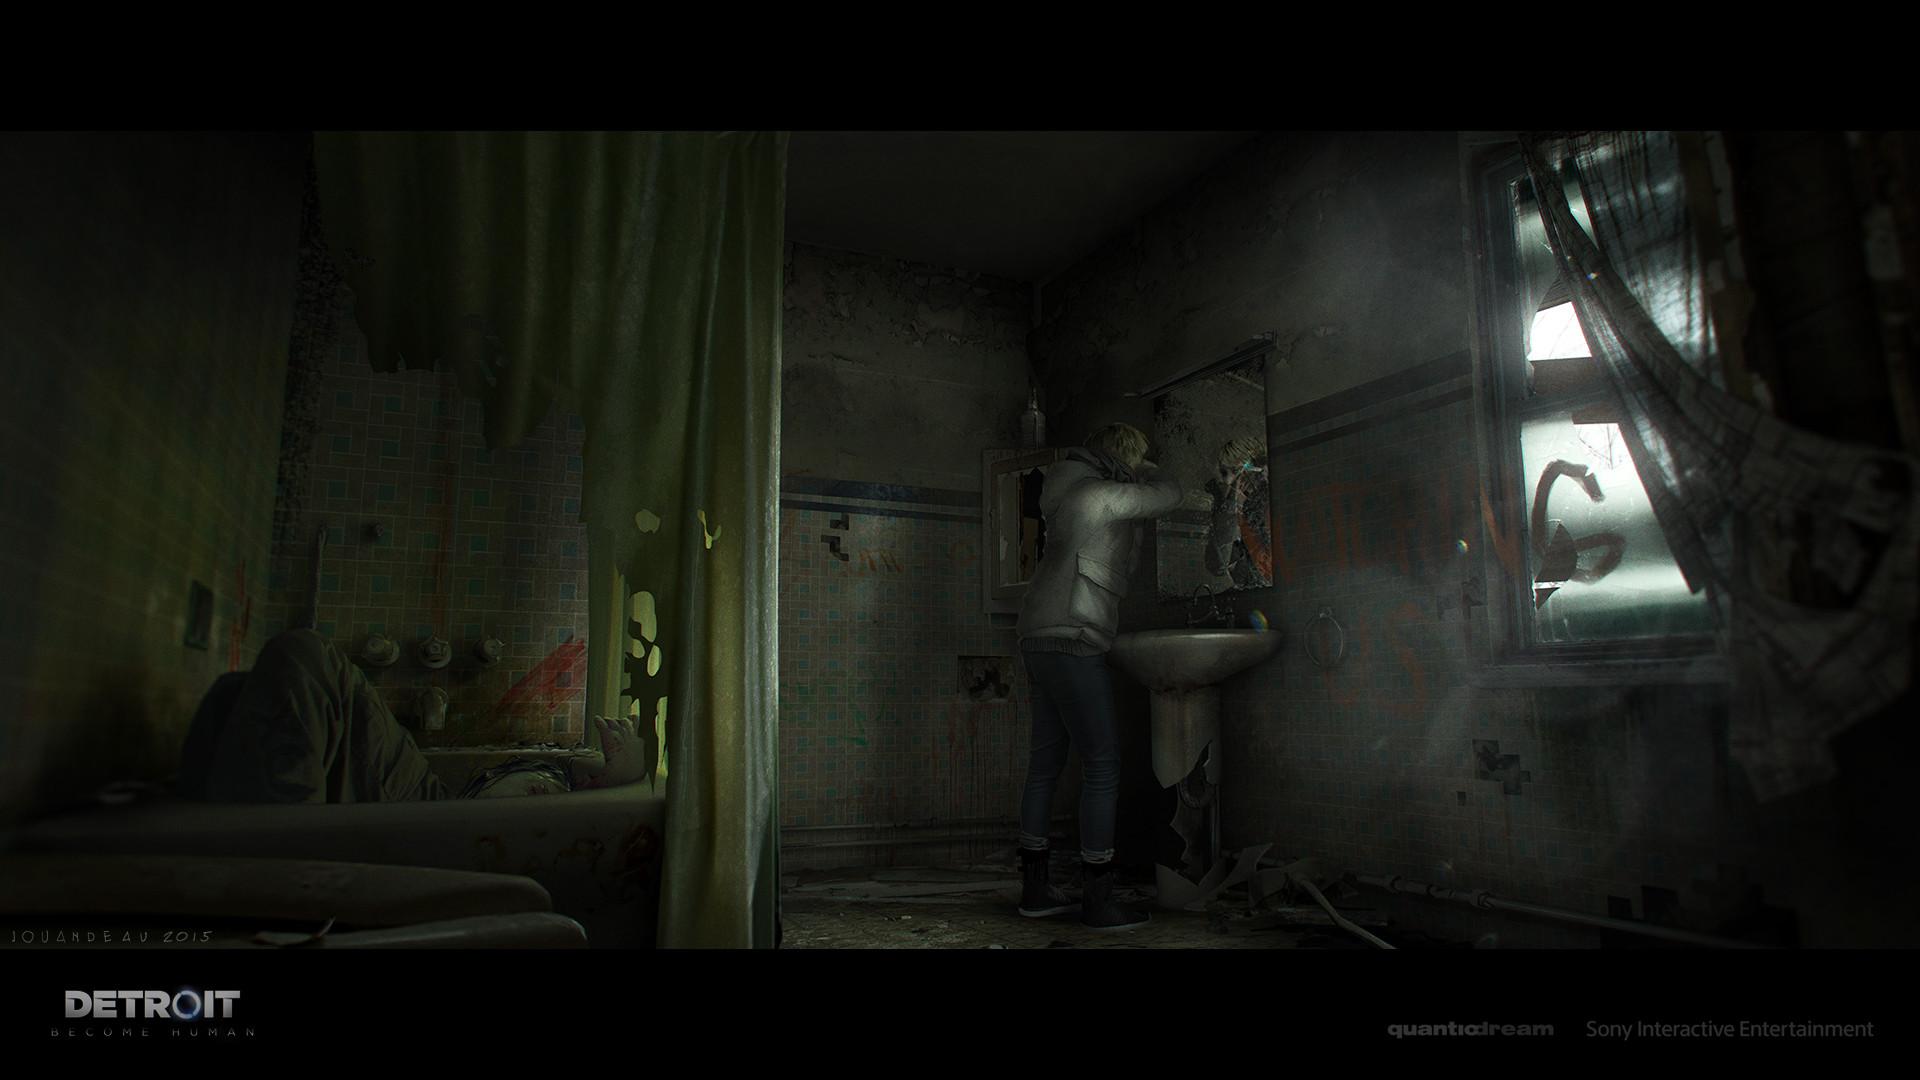 Romain jouandeau set act 2 s04k on the run ralph bathroom v05